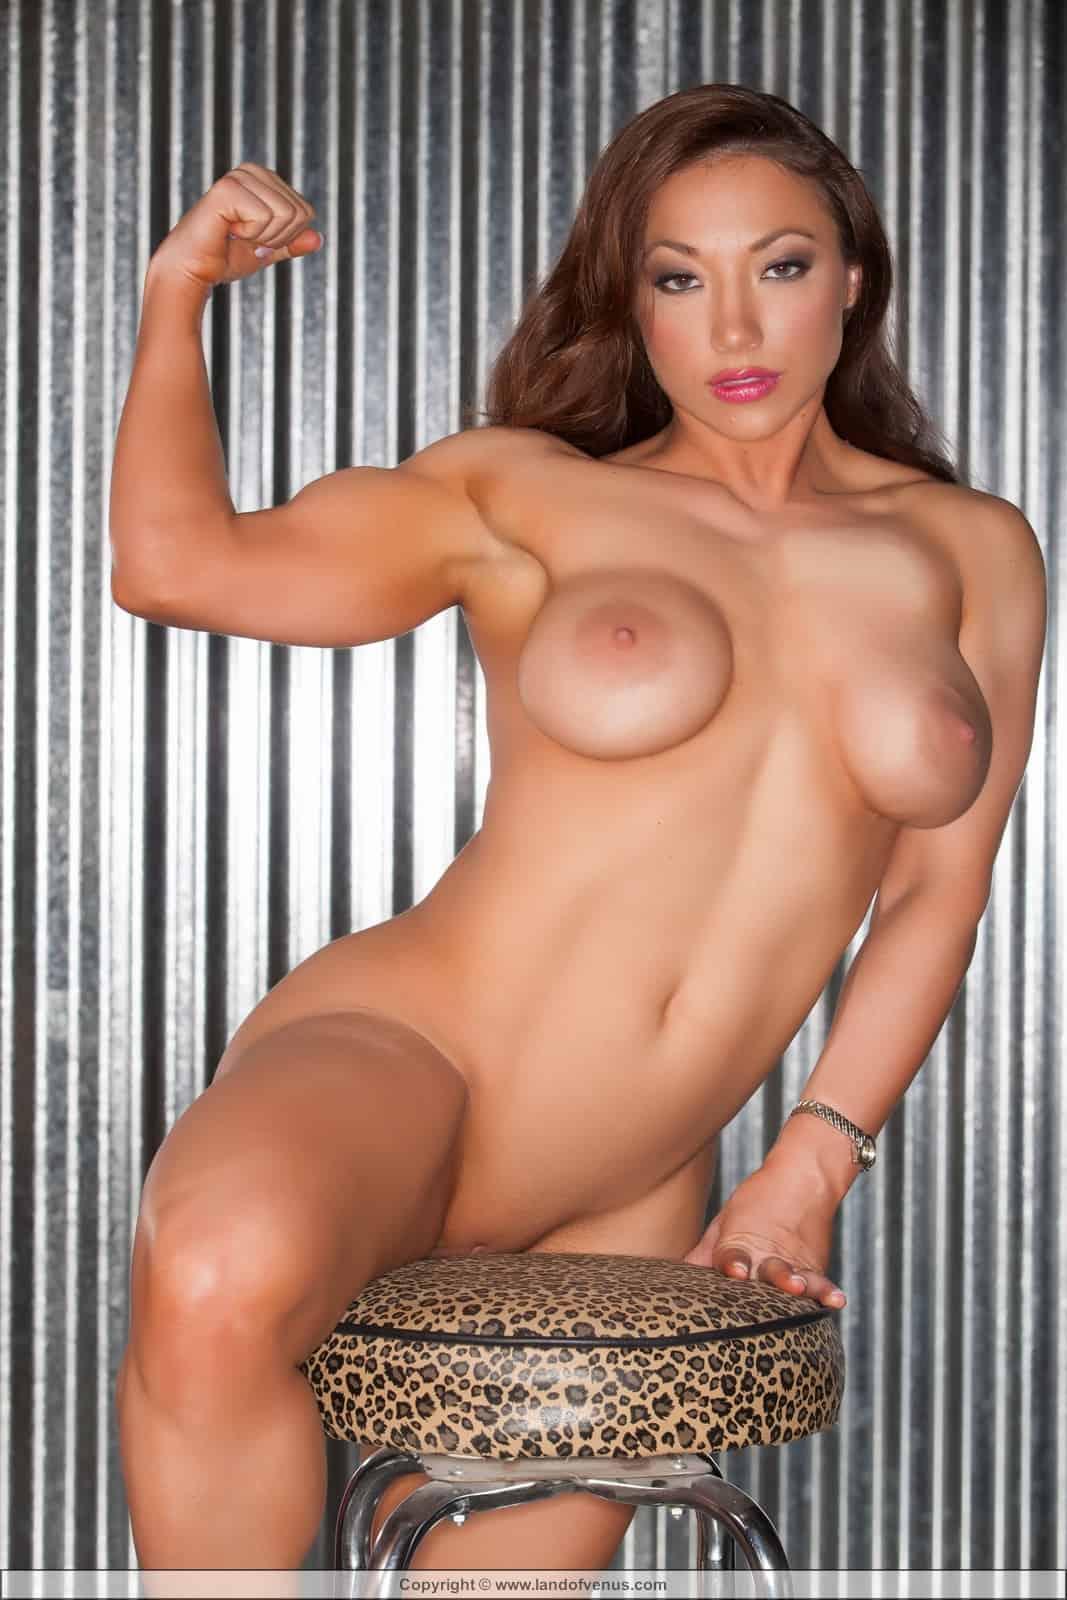 Nude female bodybuilder brandimae masturbates and says its s